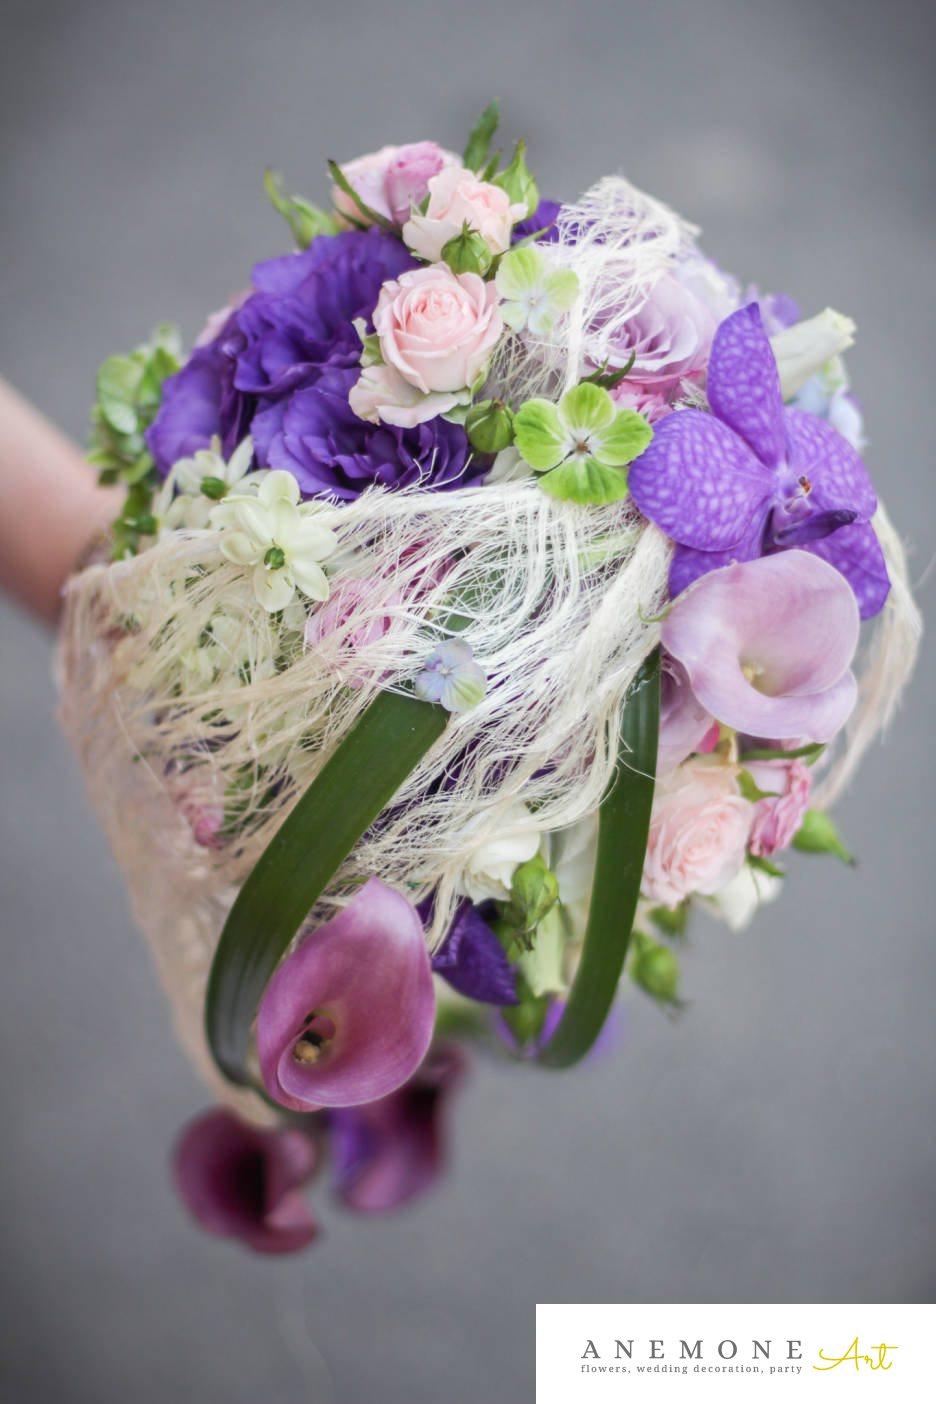 Poza, foto cu Flori de nunta alb, buchet mireasa, calla, curgator, mini-rosa, mov, orhidee, ornitogallum, roz, trandafiri in Arad, Timisoara, Oradea (wedding flowers, bouquets) nunta Arad, Timisoara, Oradea